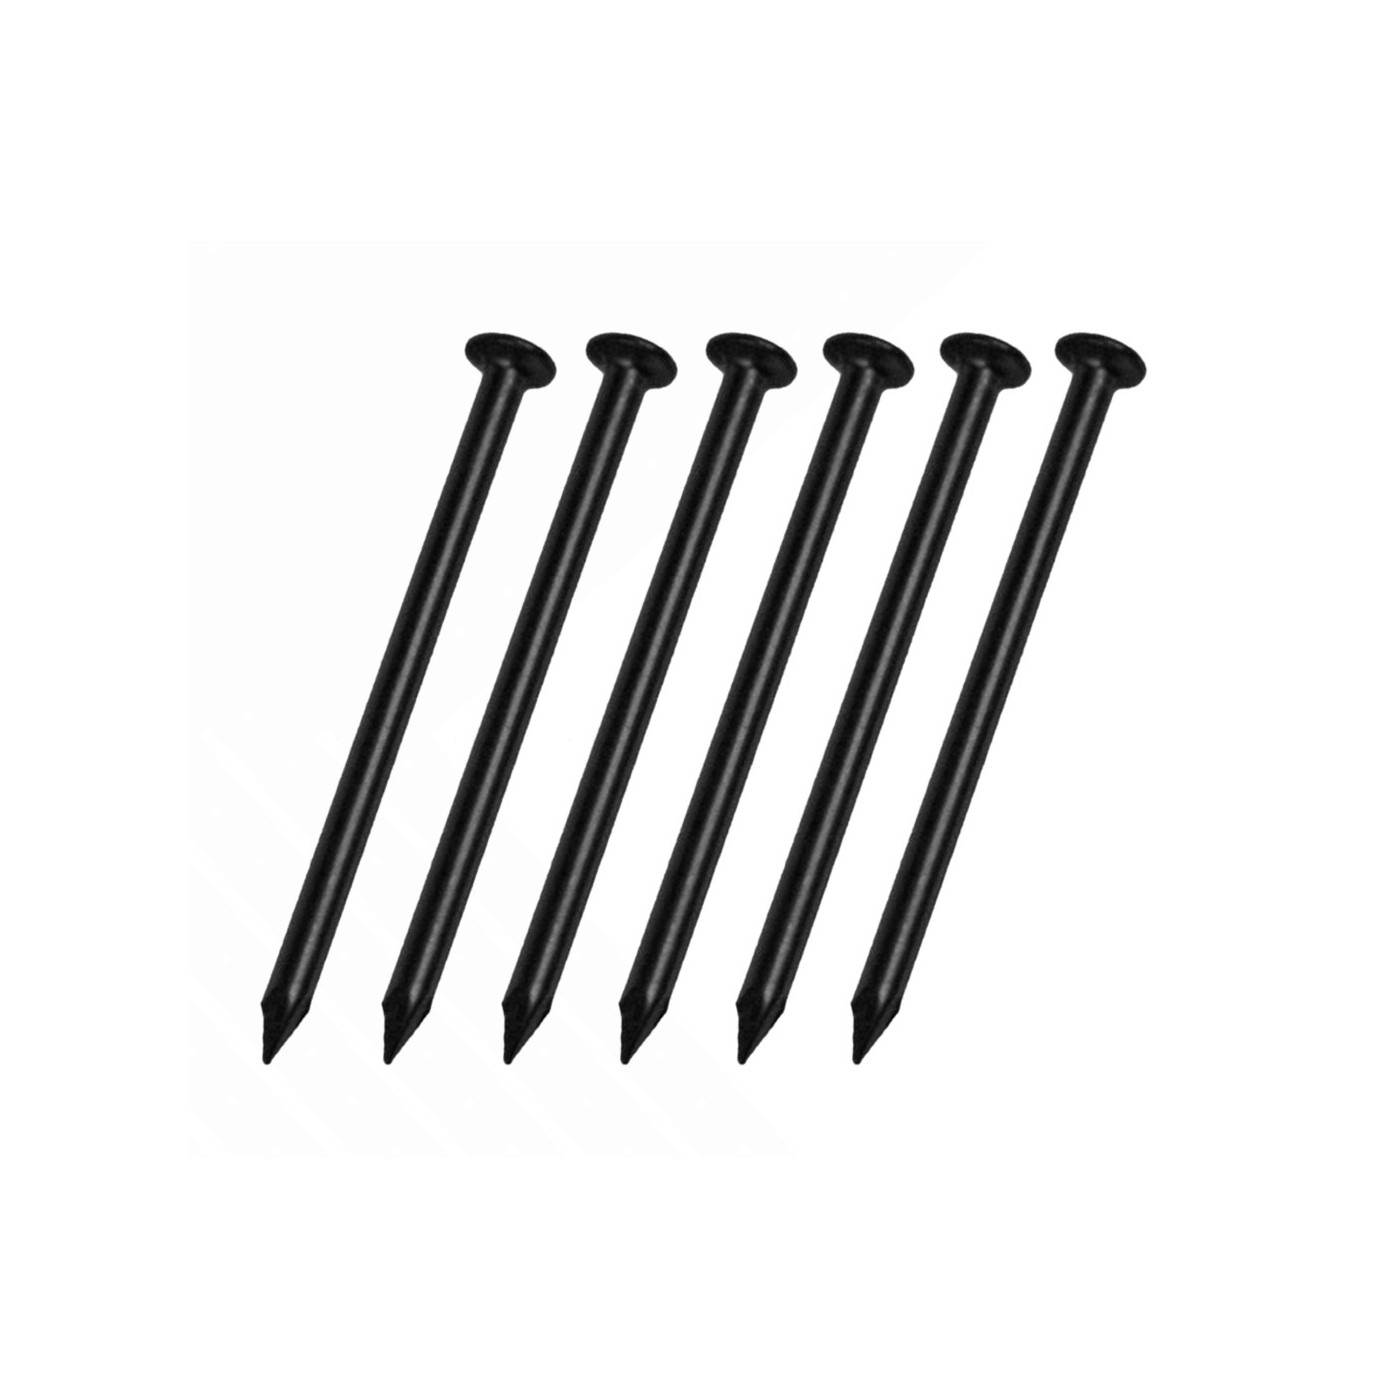 Set of 260 steel nails (2.0x40 mm, black)